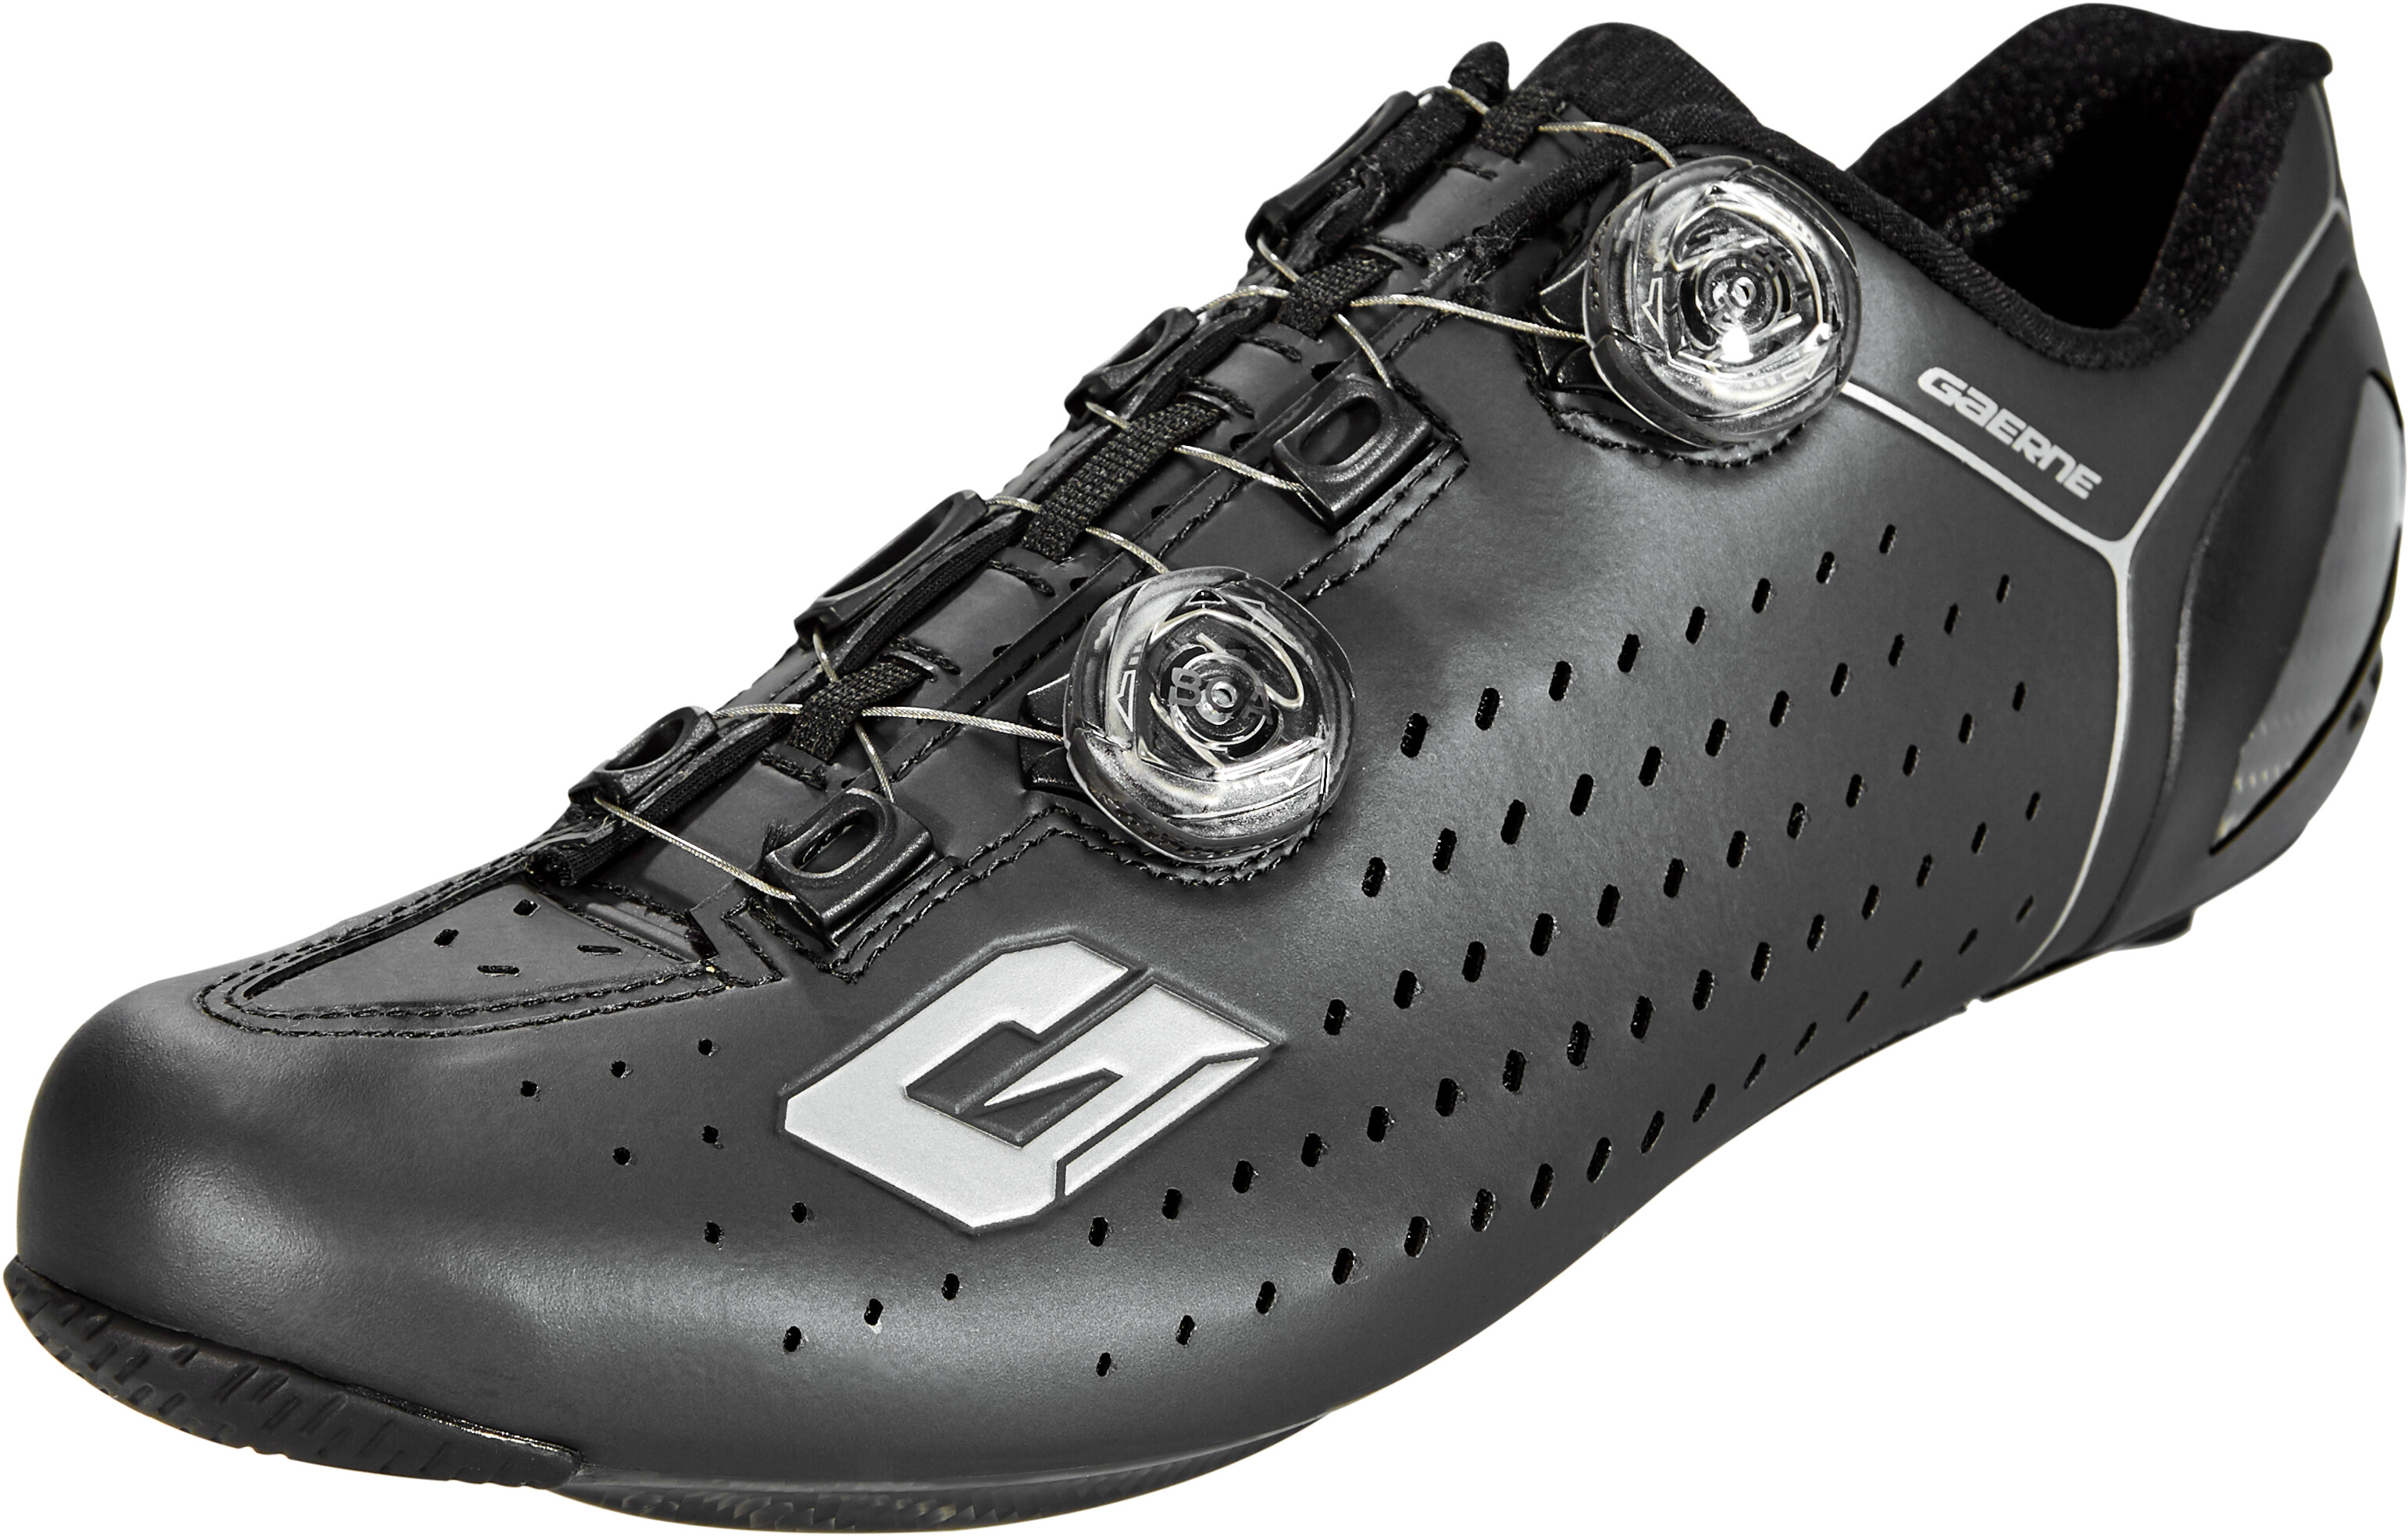 the best attitude e1ec5 4bb6a Gaerne Carbon G.Stilo Scarpe da ciclismo Uomo, black